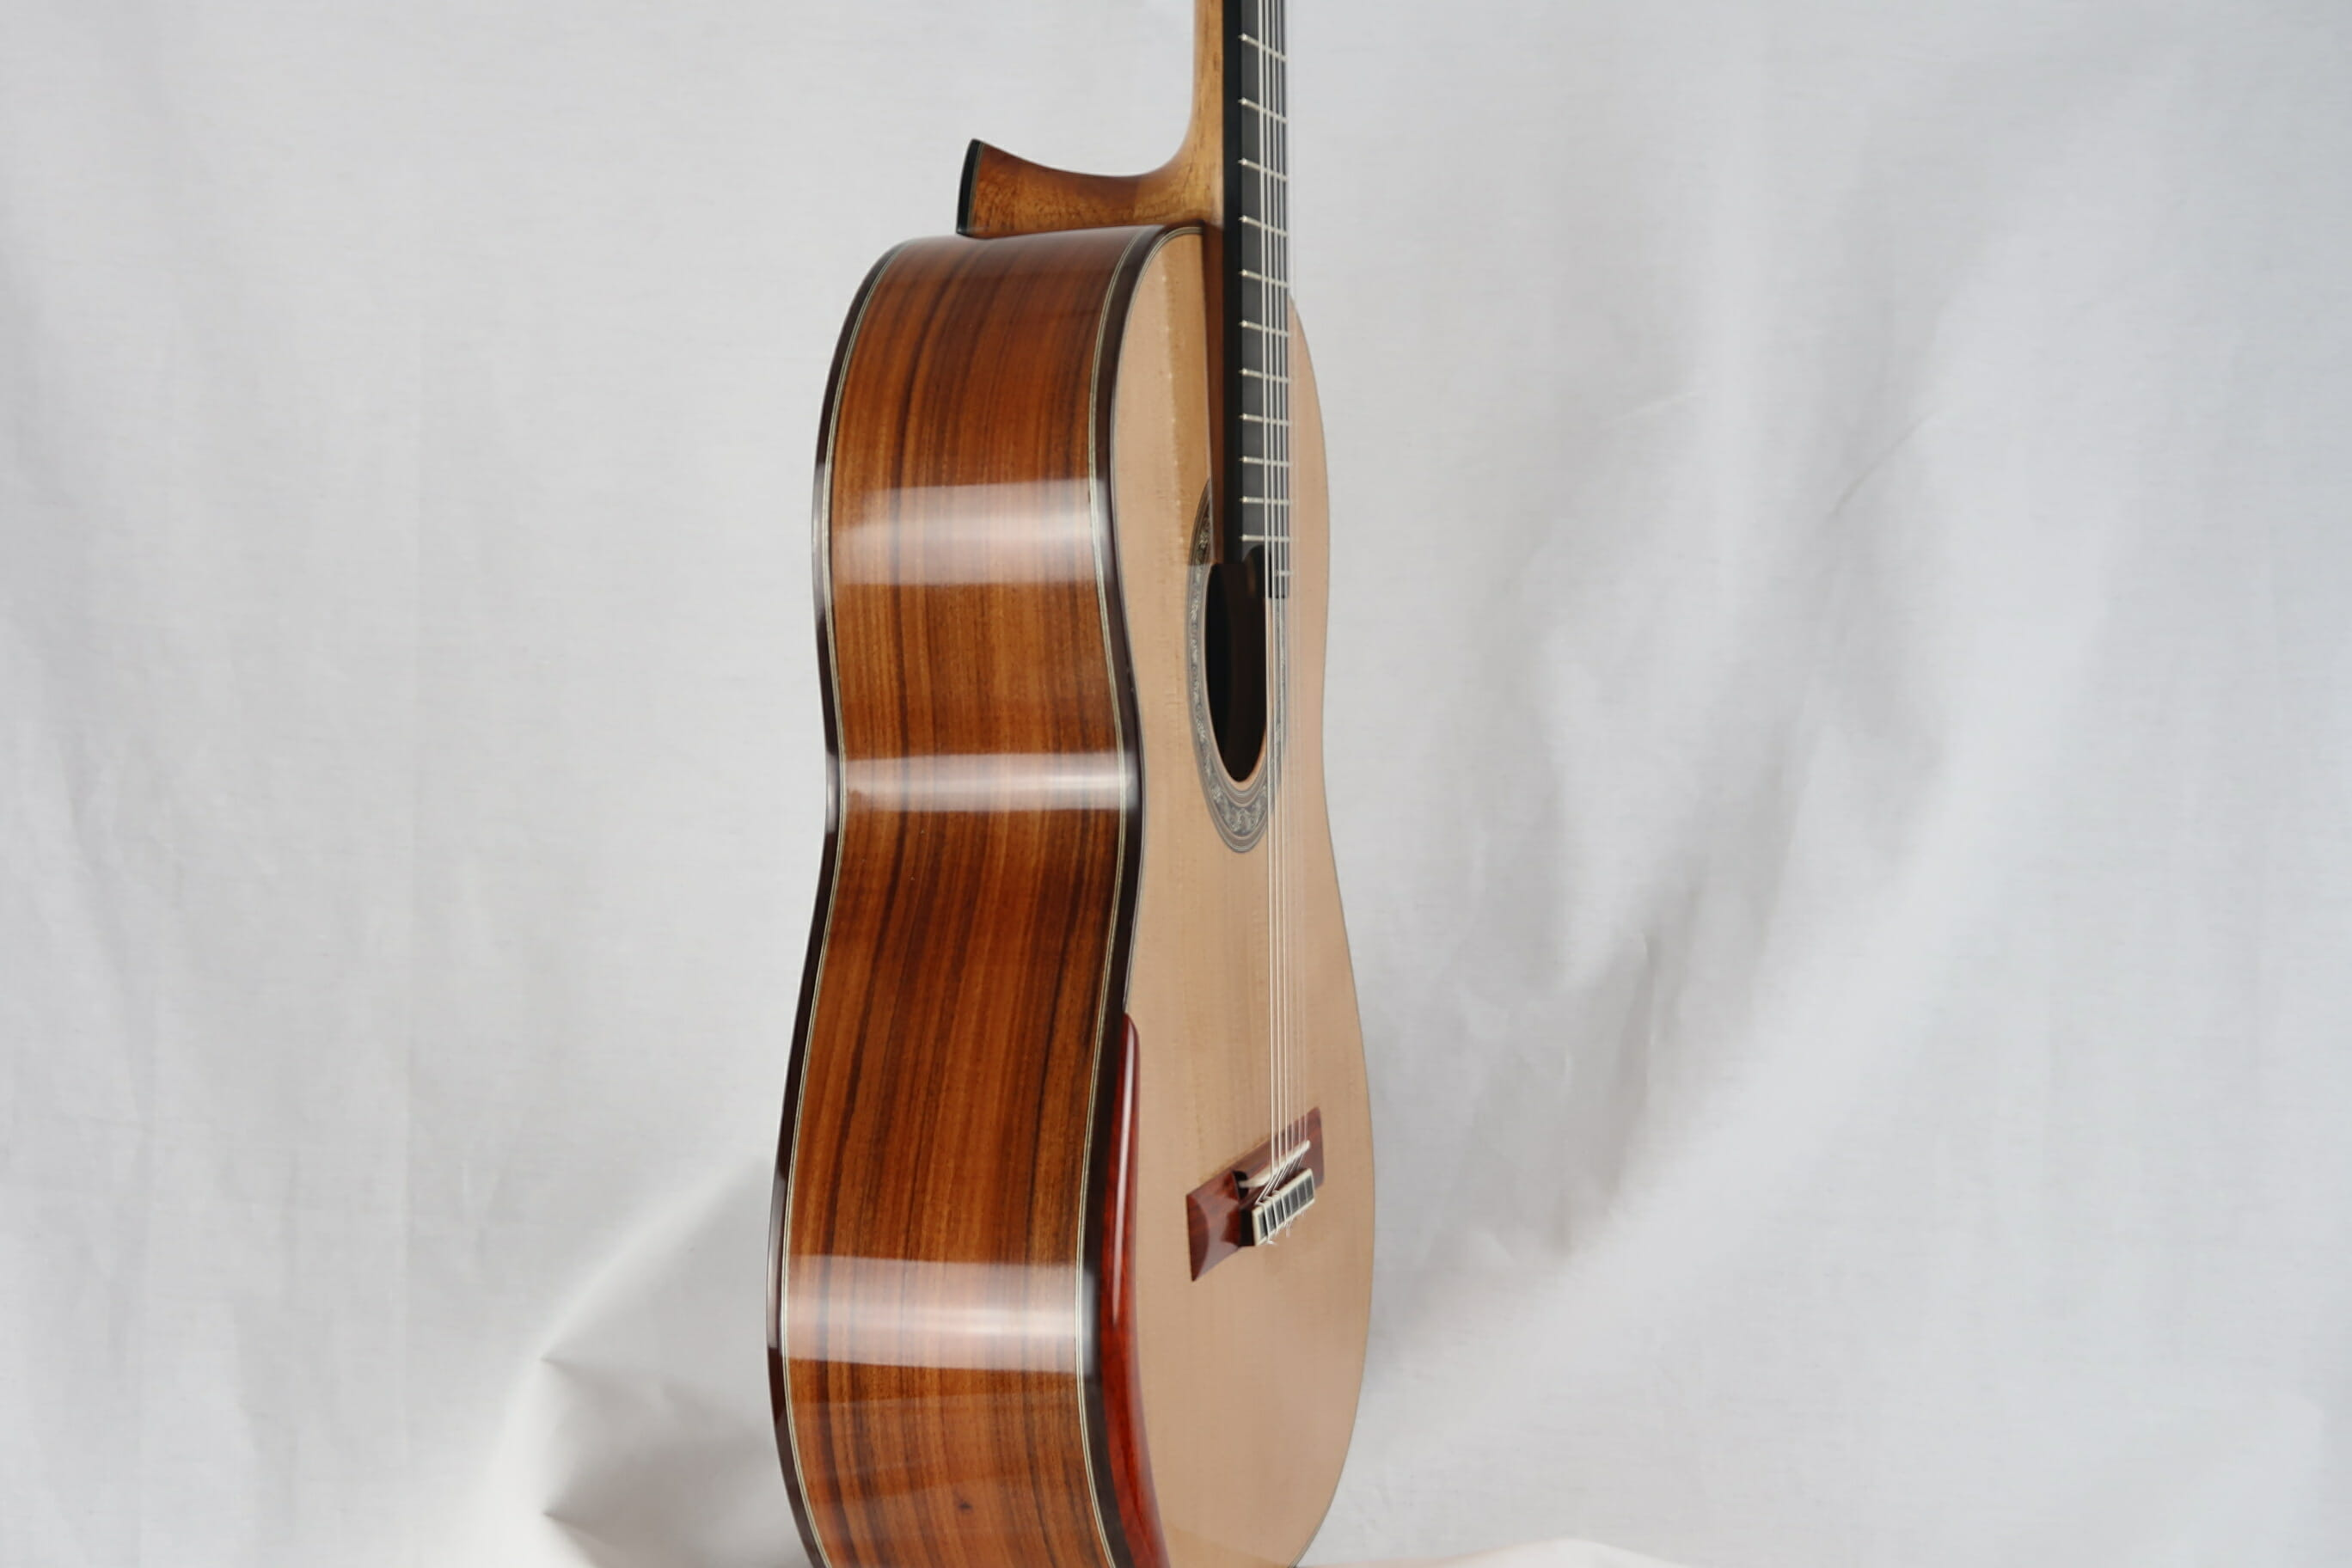 Guitare classique luthier Charalampos Koumridis barrage lattice No 124 19KOU124-06